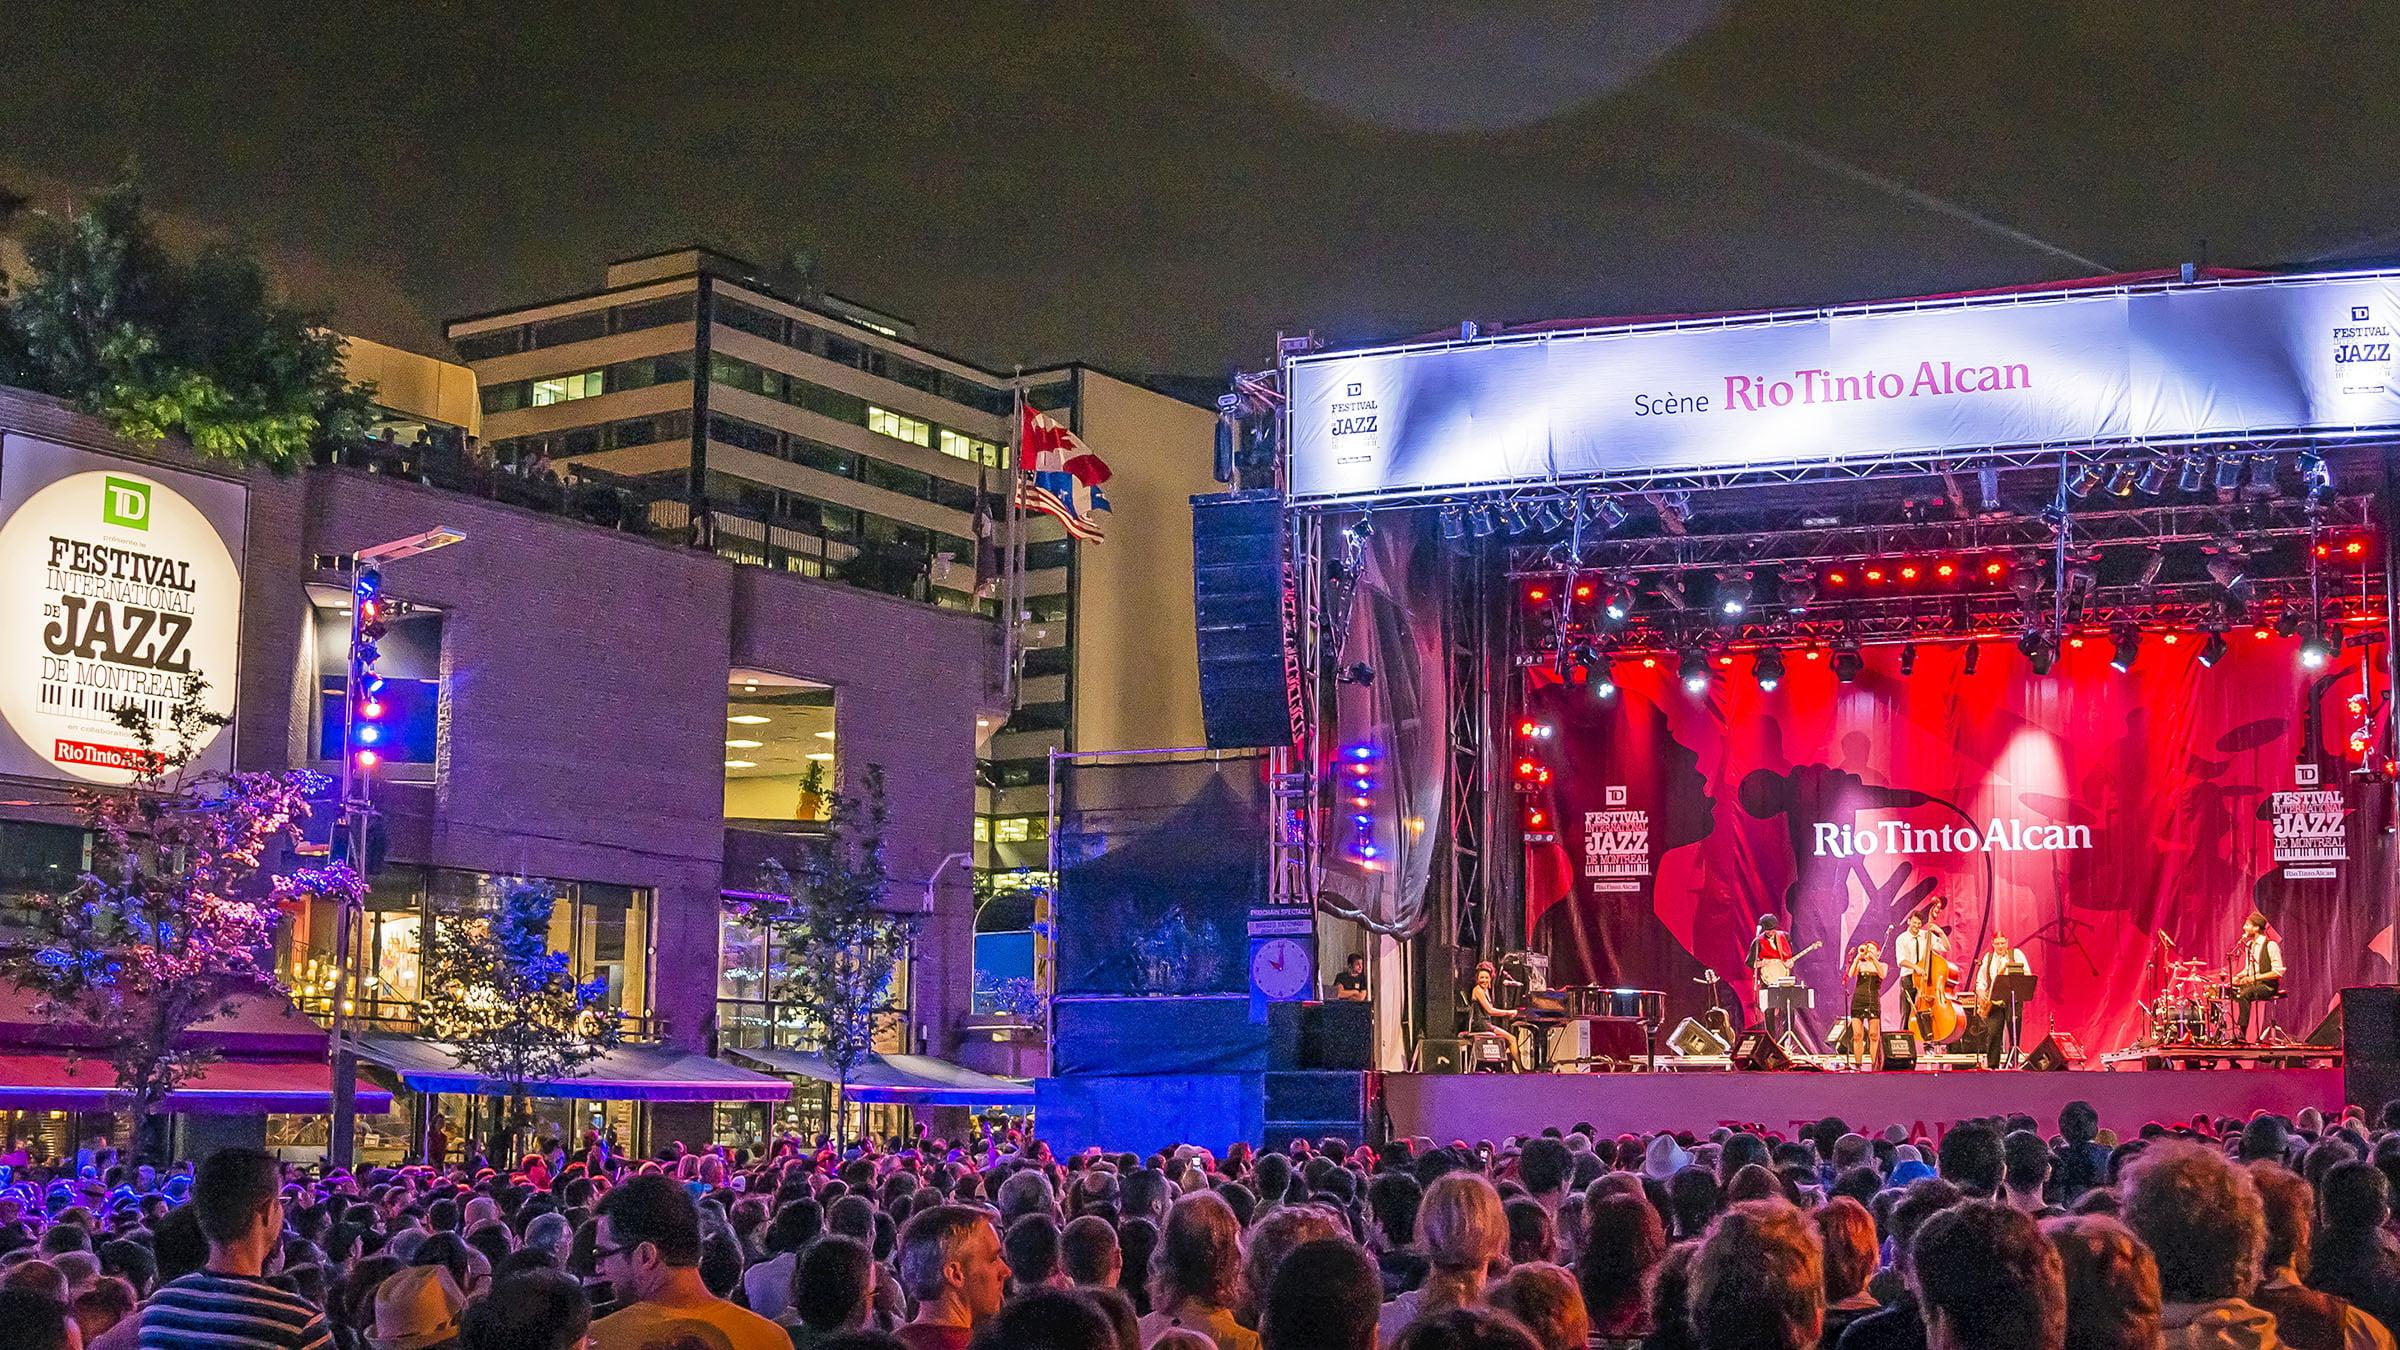 Festival de jazz - en Montreal Canadá